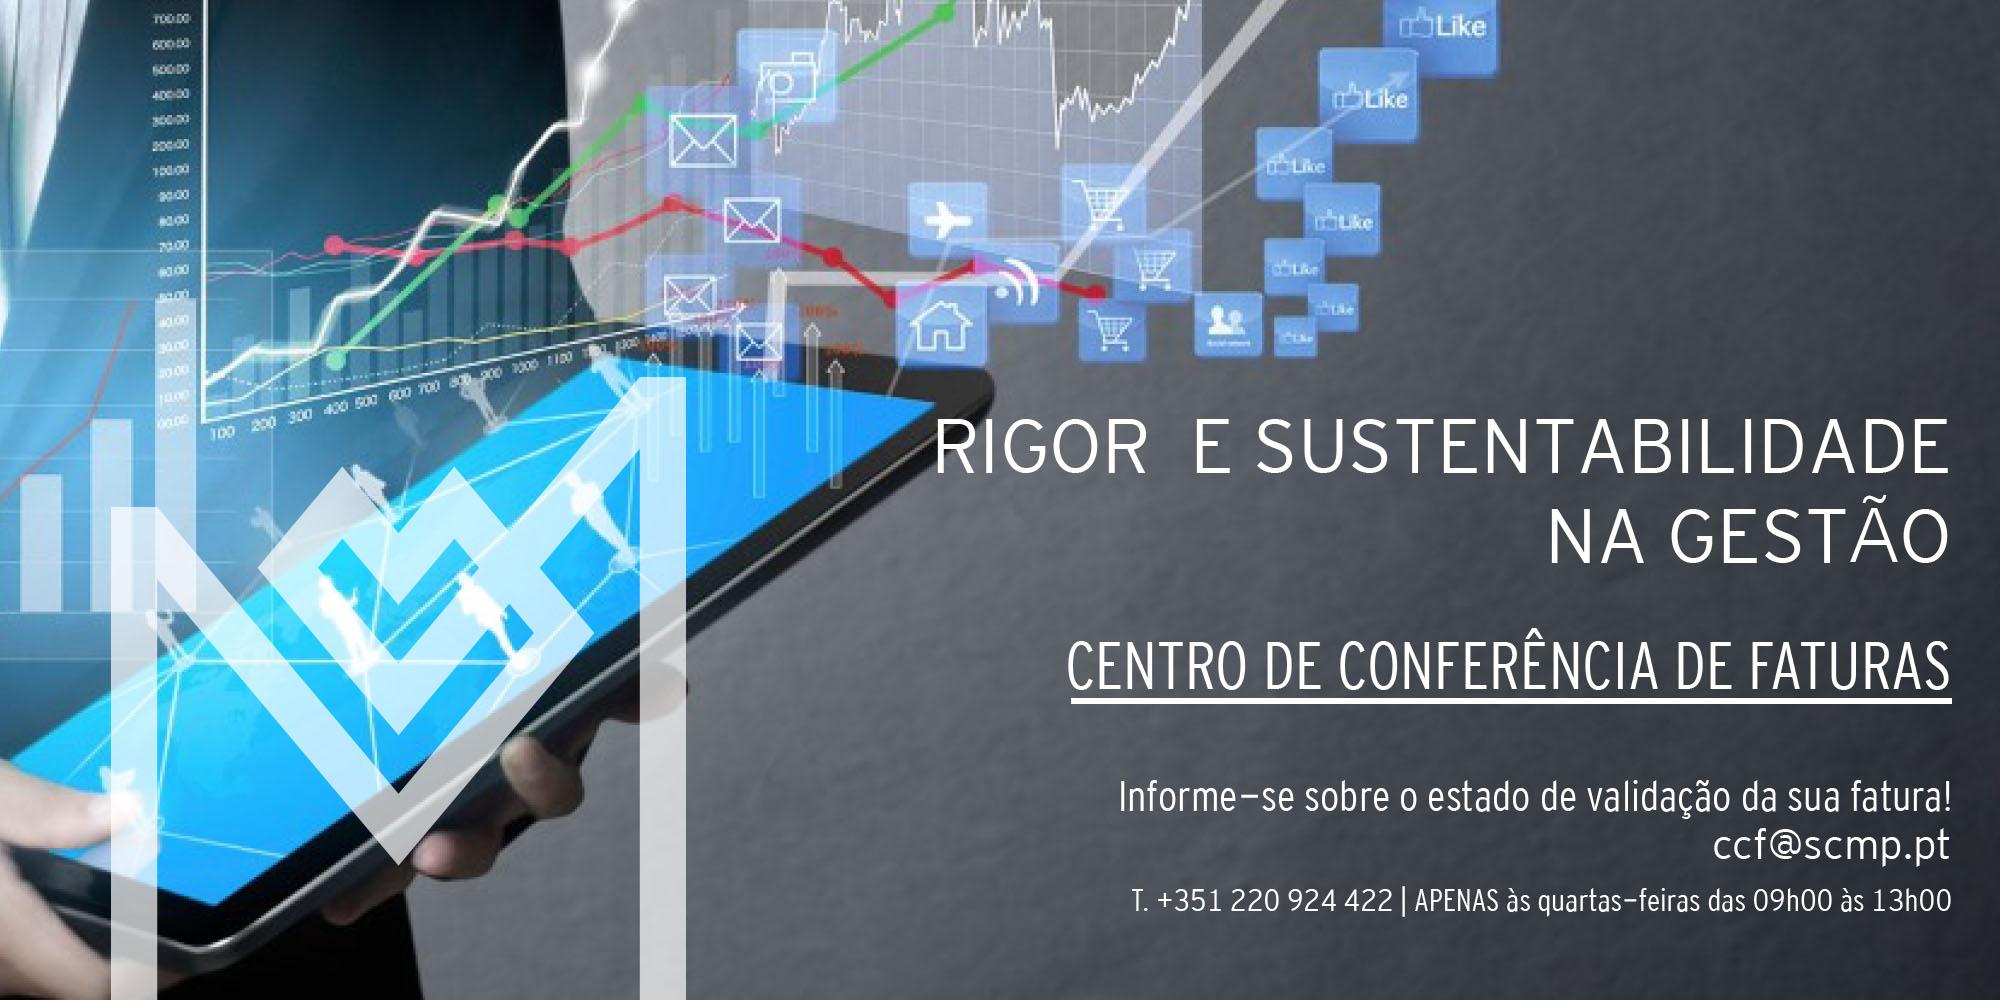 https://www.scmp.pt/assets/misc/img/noticias/2017/20170428%20Centro%20Conf%20Faturas/Centro%20Conferencia%20Faturas.jpg